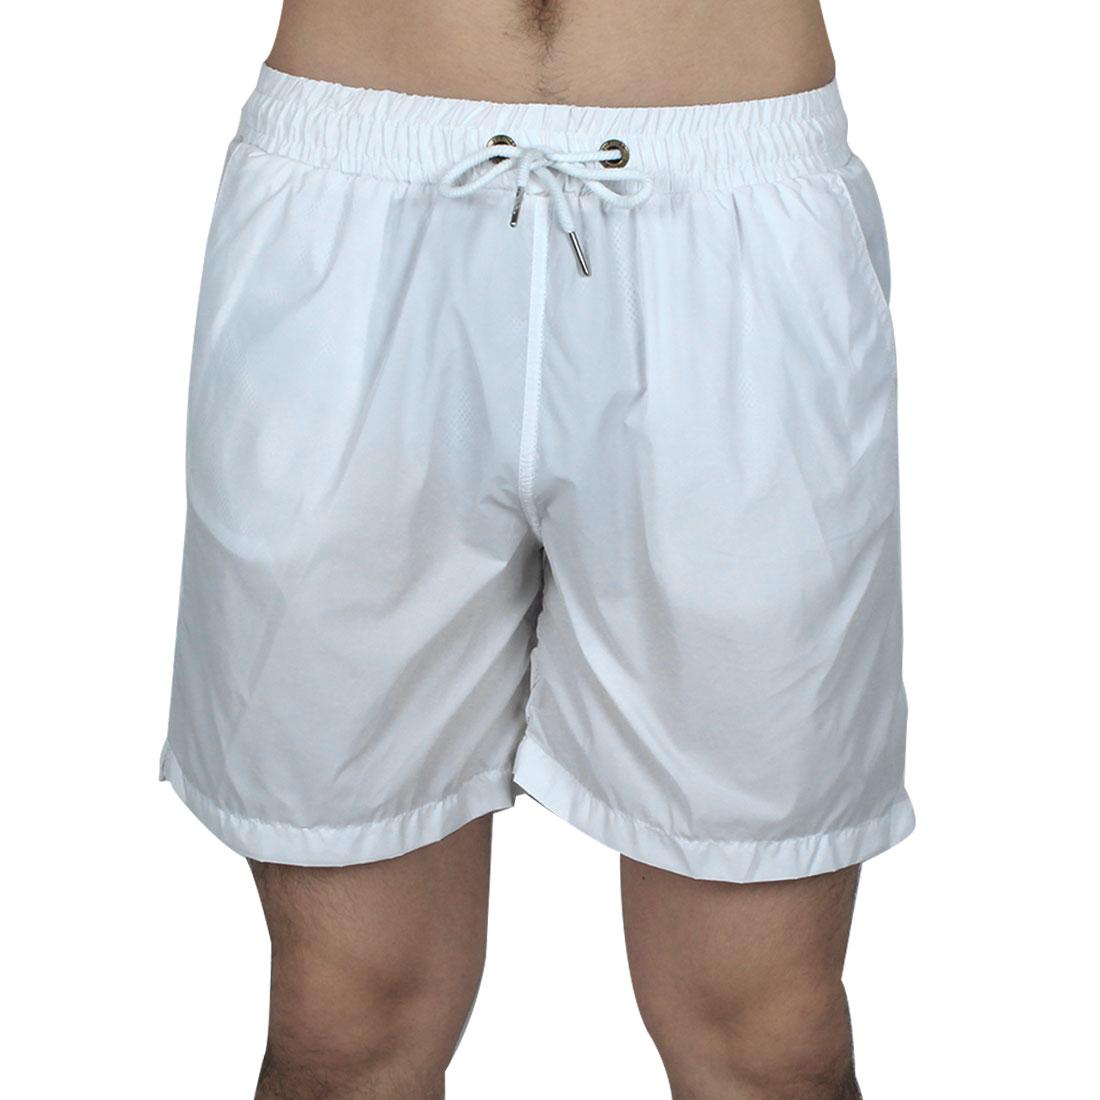 Men Exercise Running Polyester Summer Beach Surf Board Shorts Pants White W34